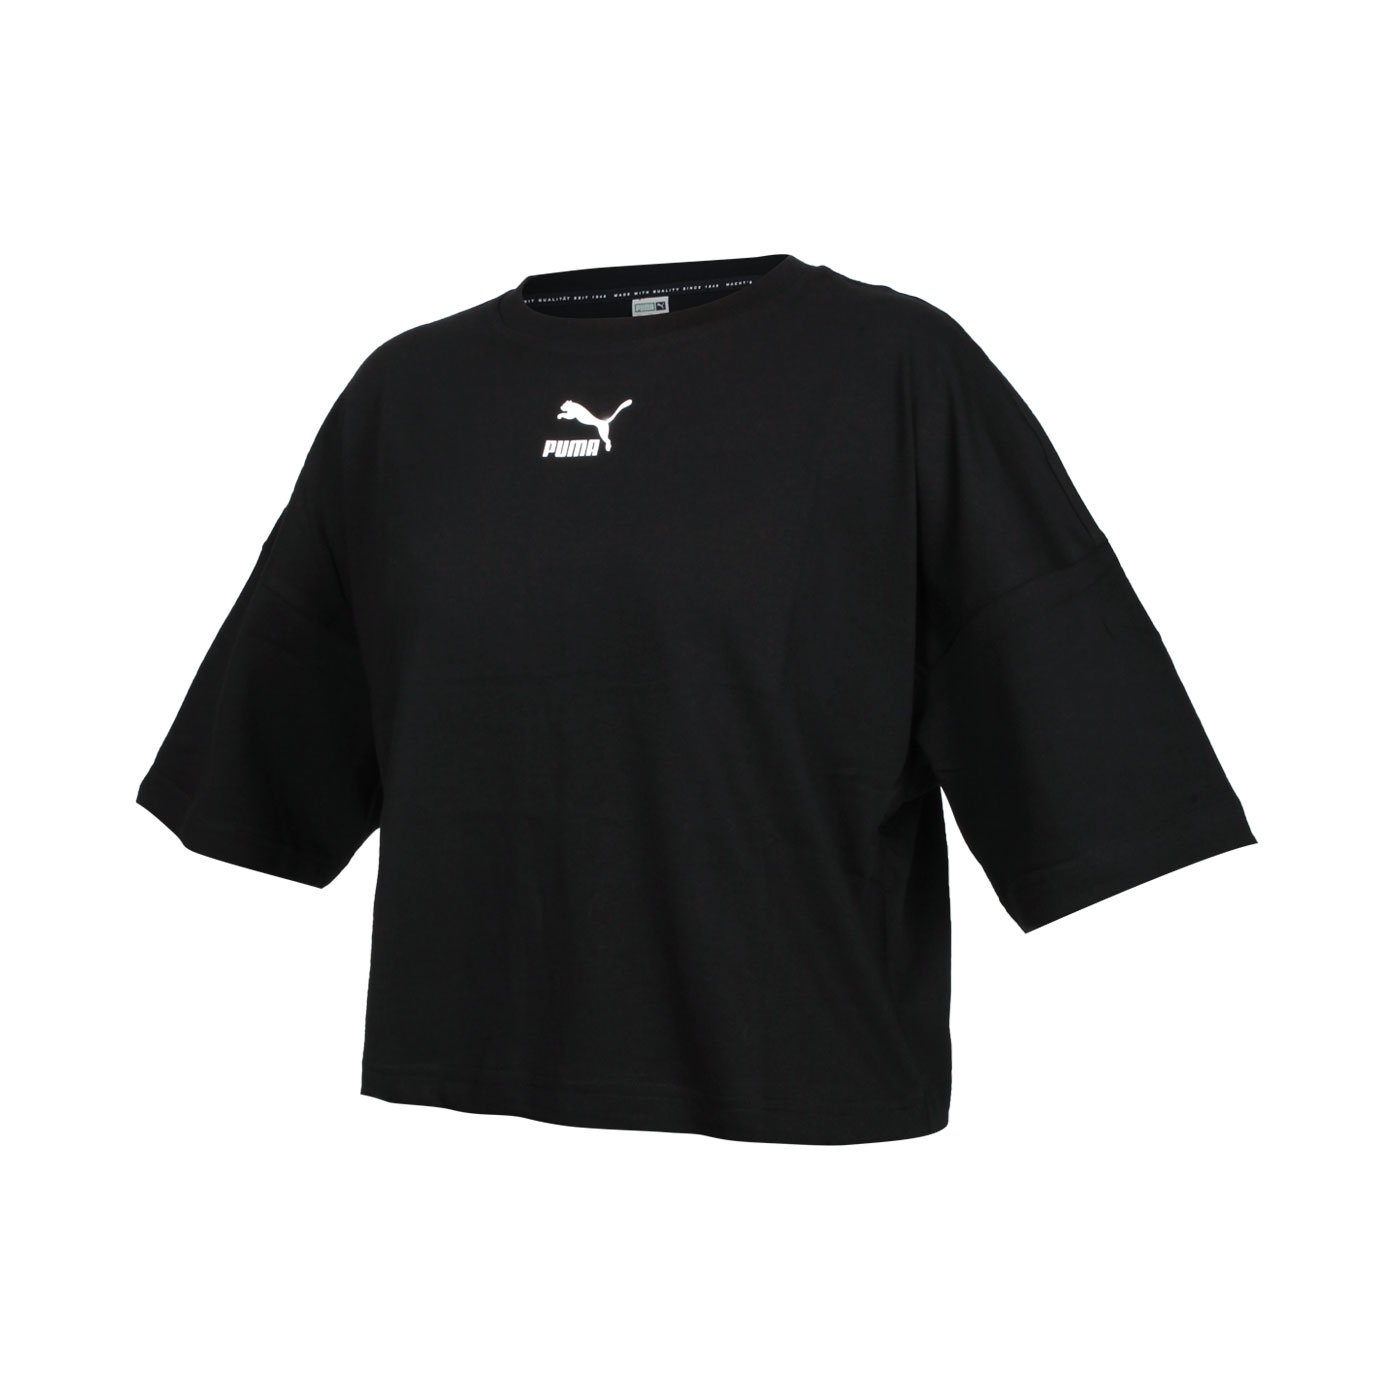 PUMA 女款短袖T恤 53169601 - 黑白